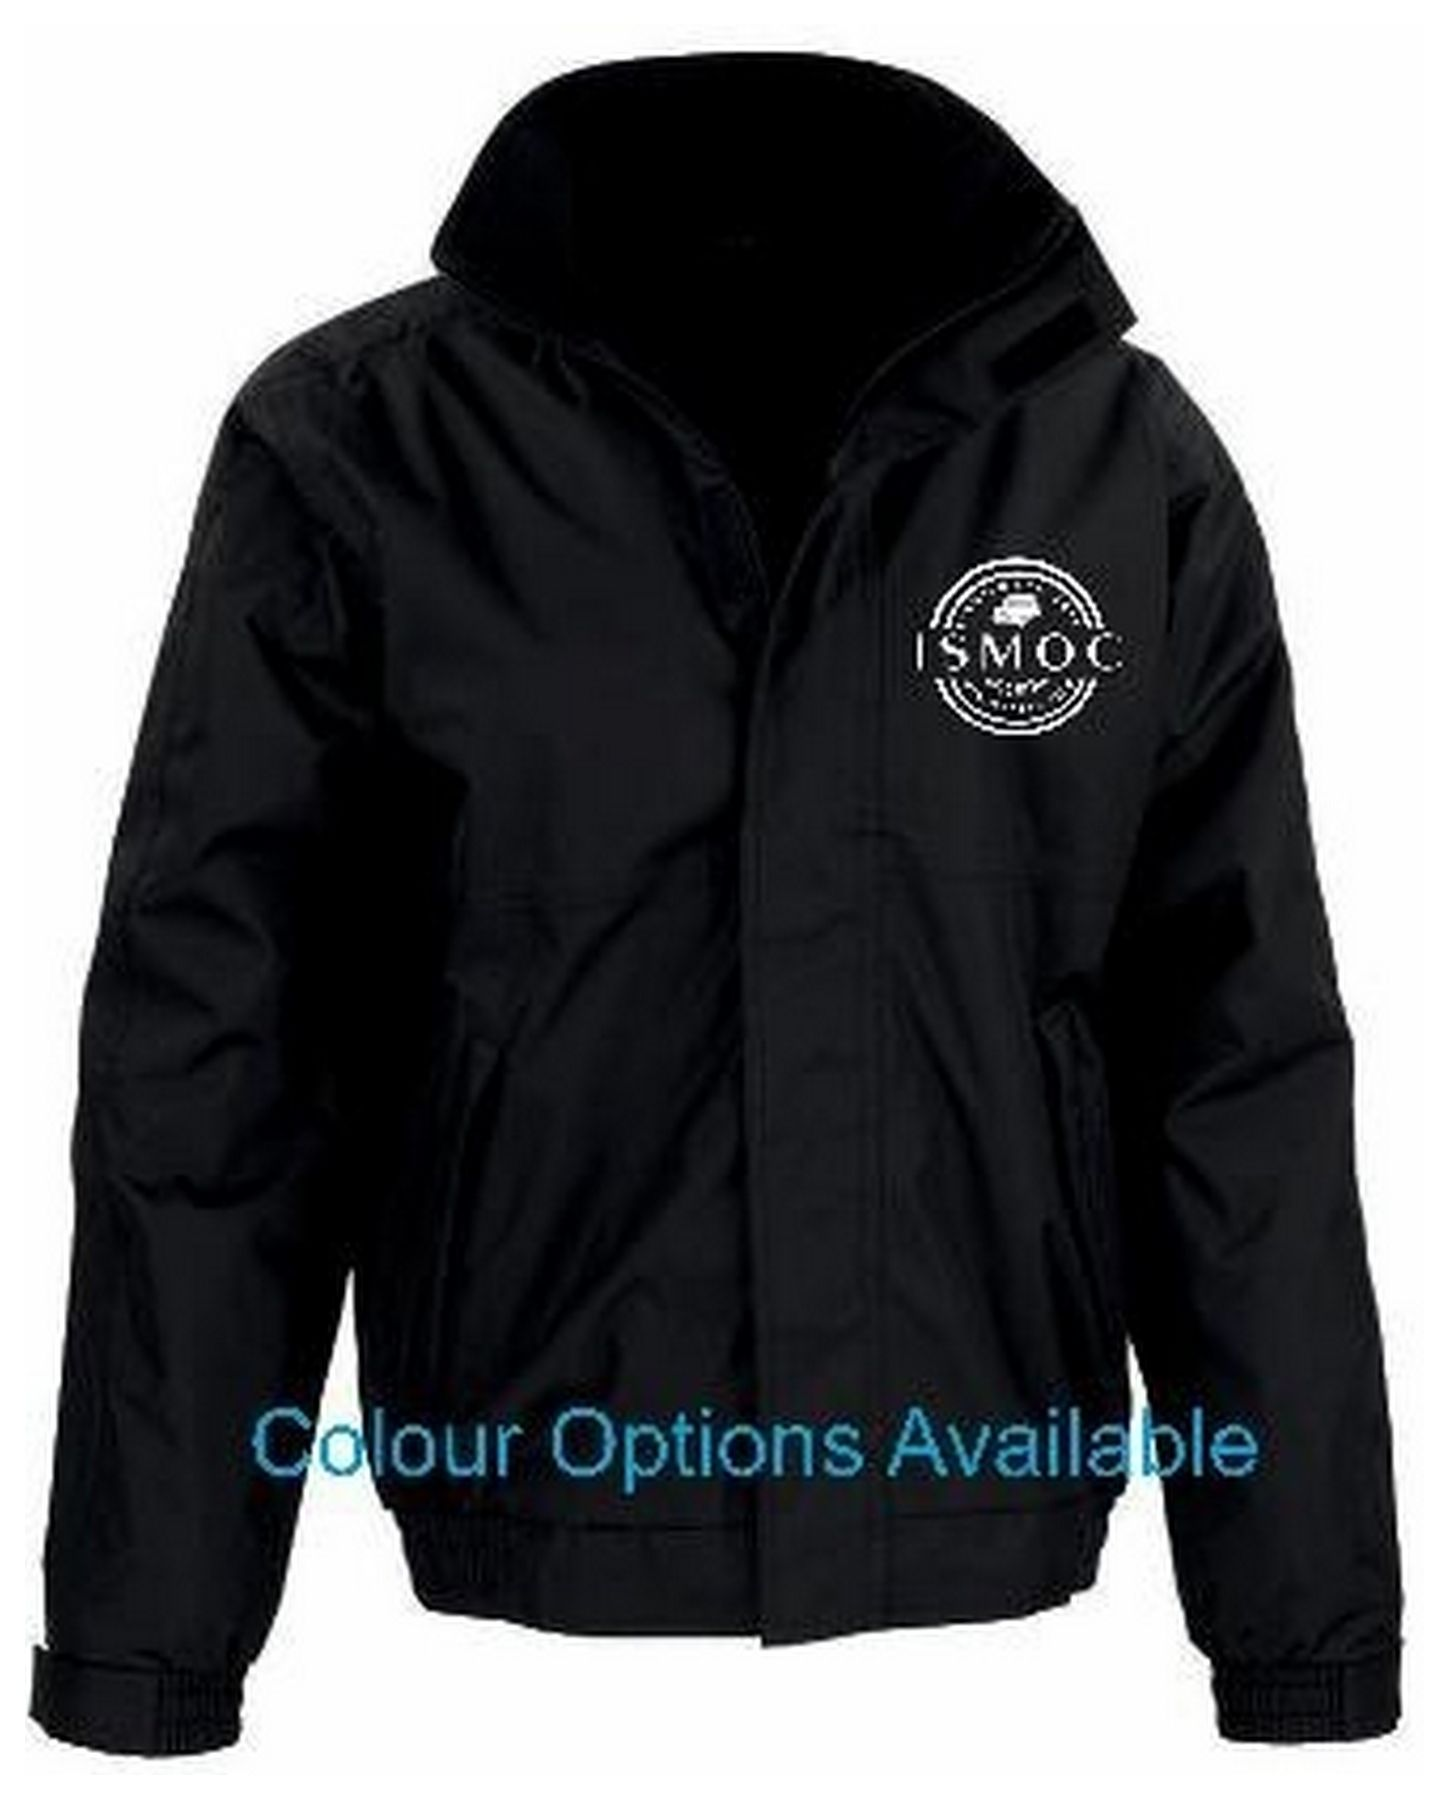 ISMOC – Core Channel Result Waterproof Jacket